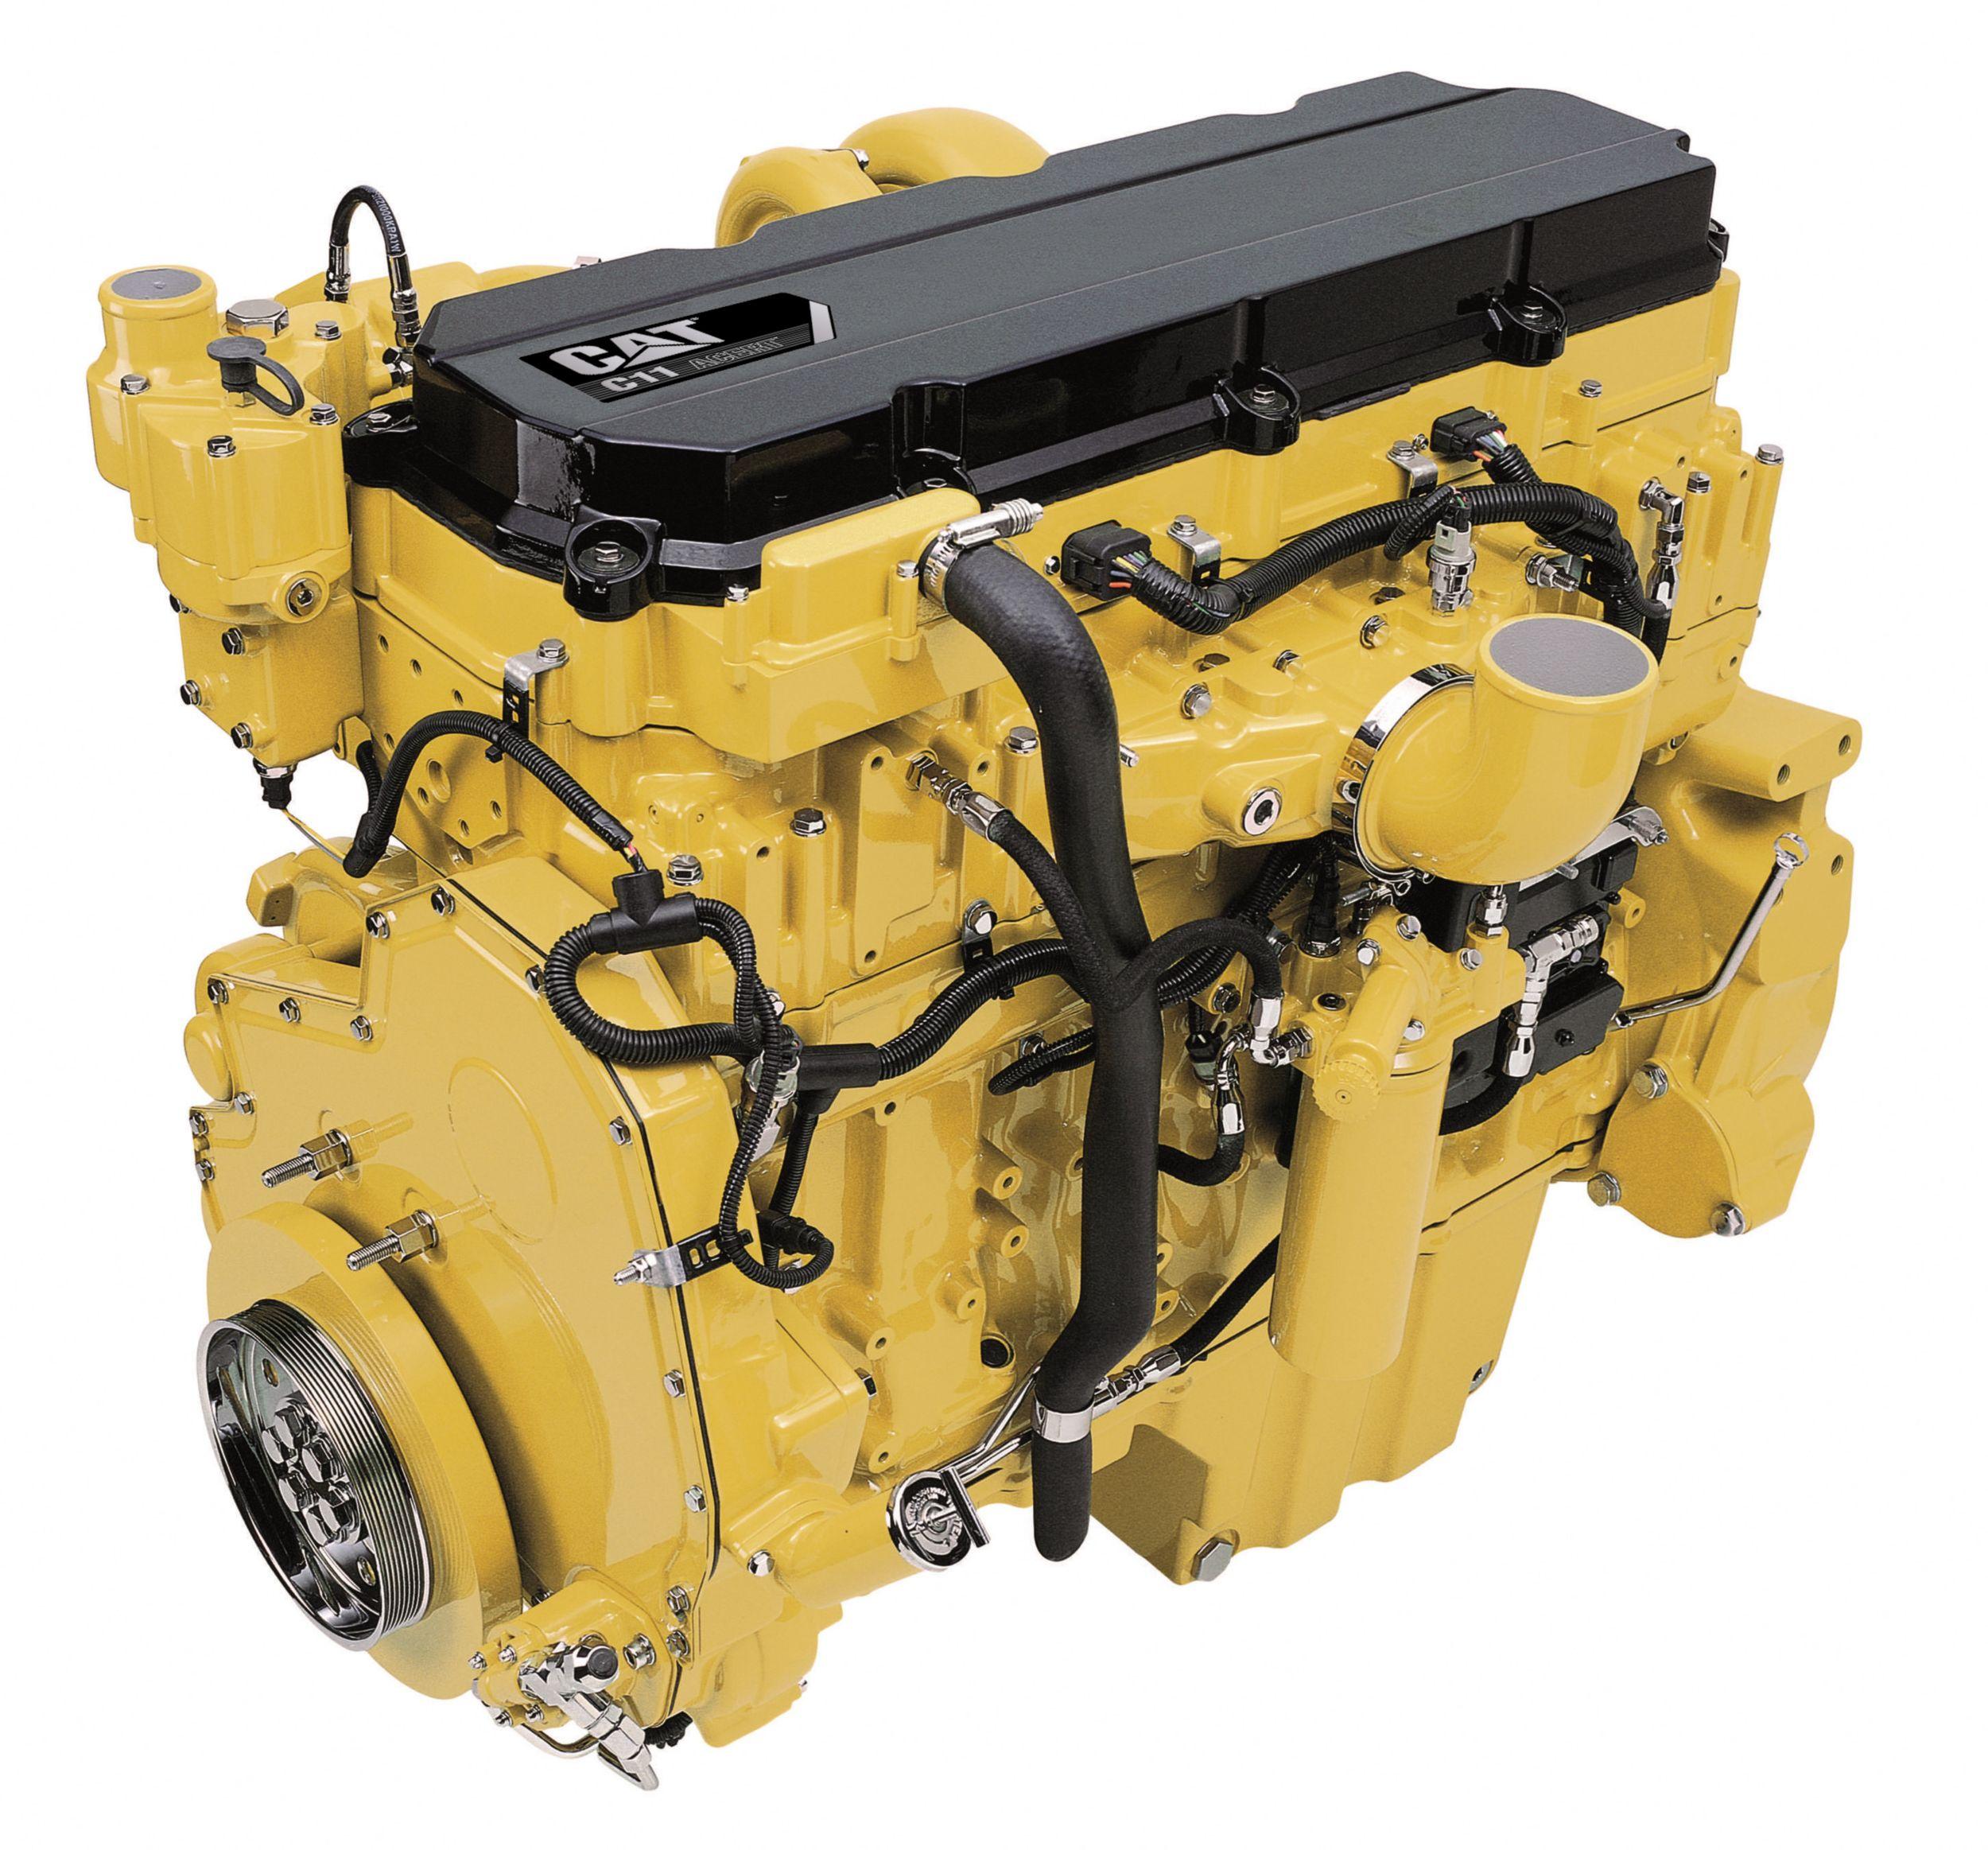 New 14m Motor Grader For Sale